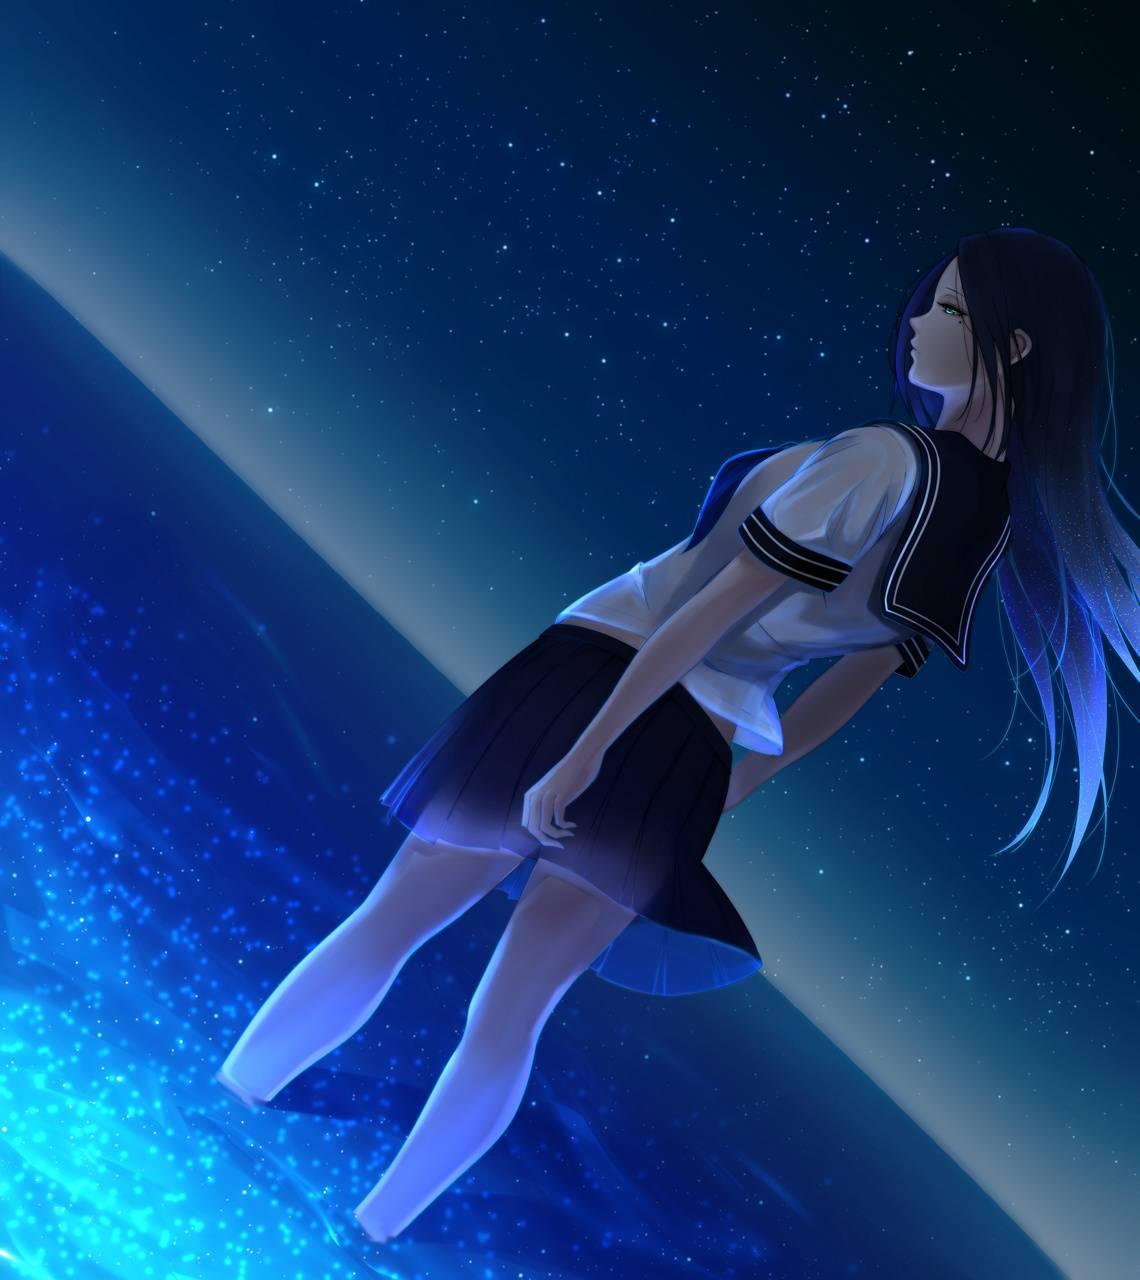 Alone Sad Girl Hd Desktop Wallpaper: 25+ Lonely Sad Anime Girl Wallpaper